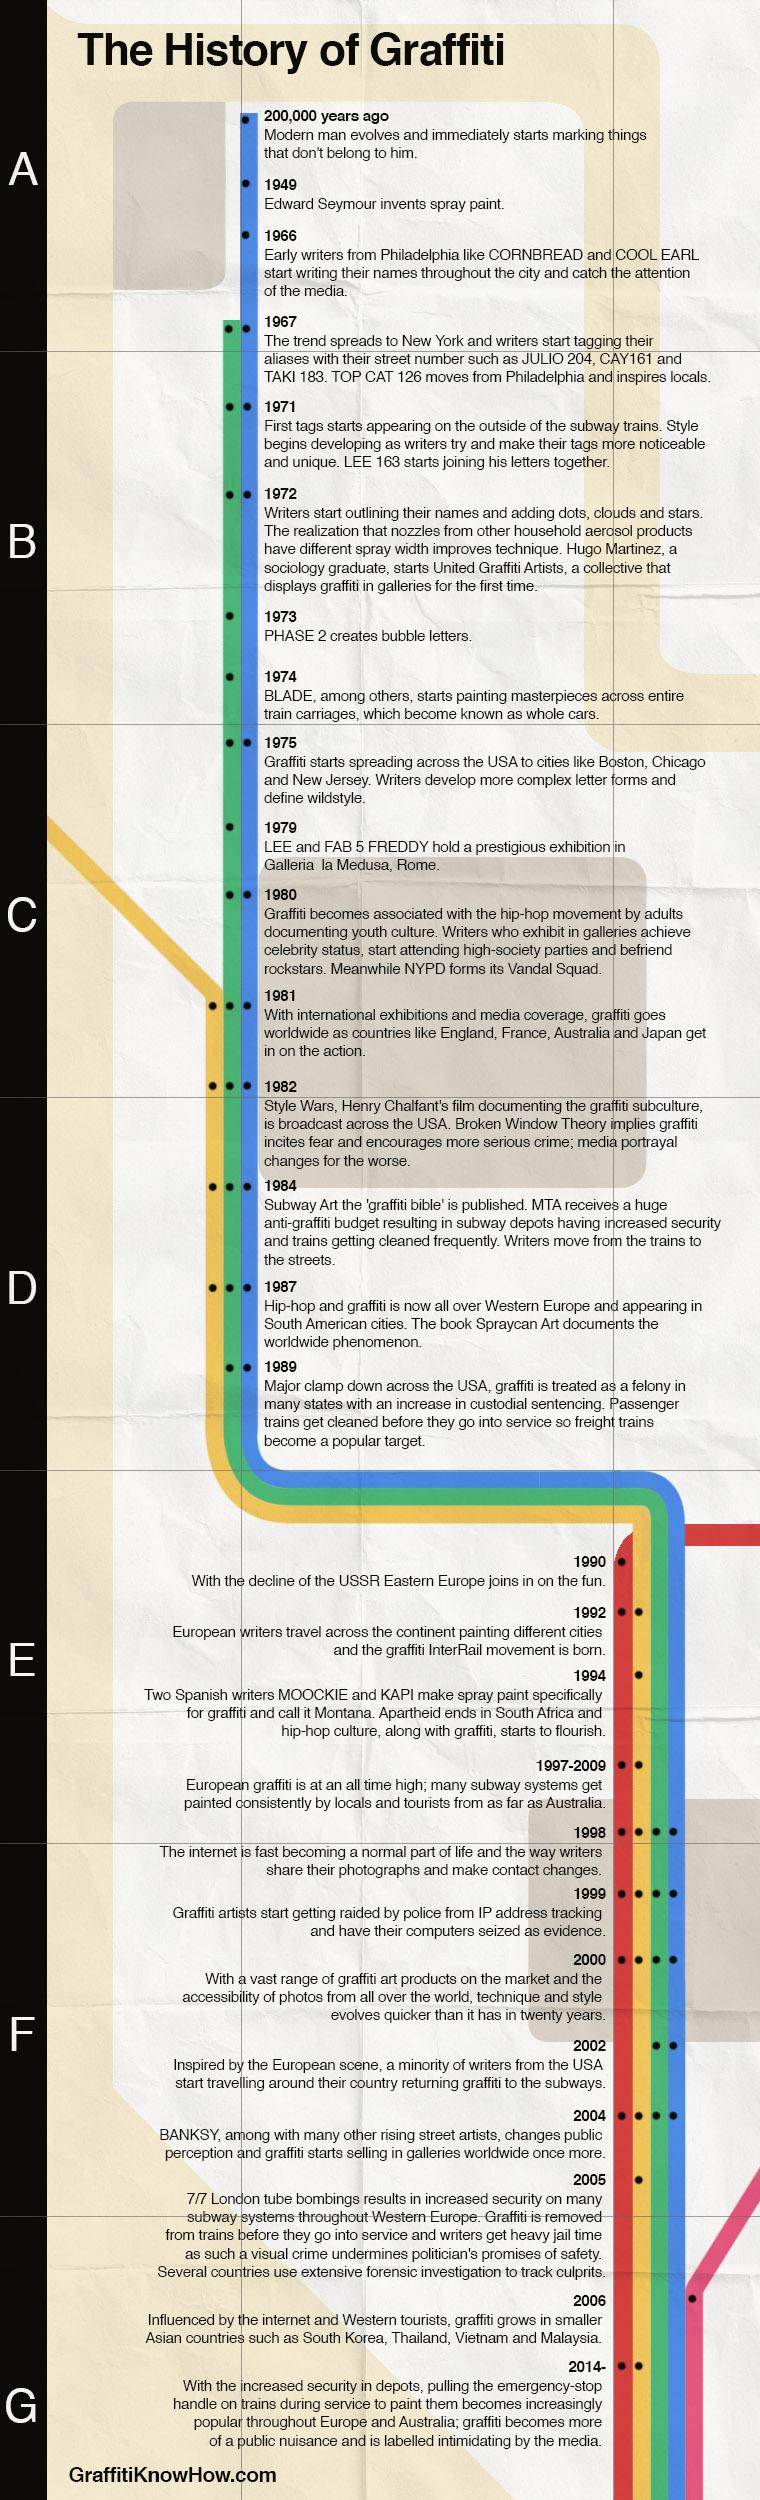 history-of-graffiti-infographic